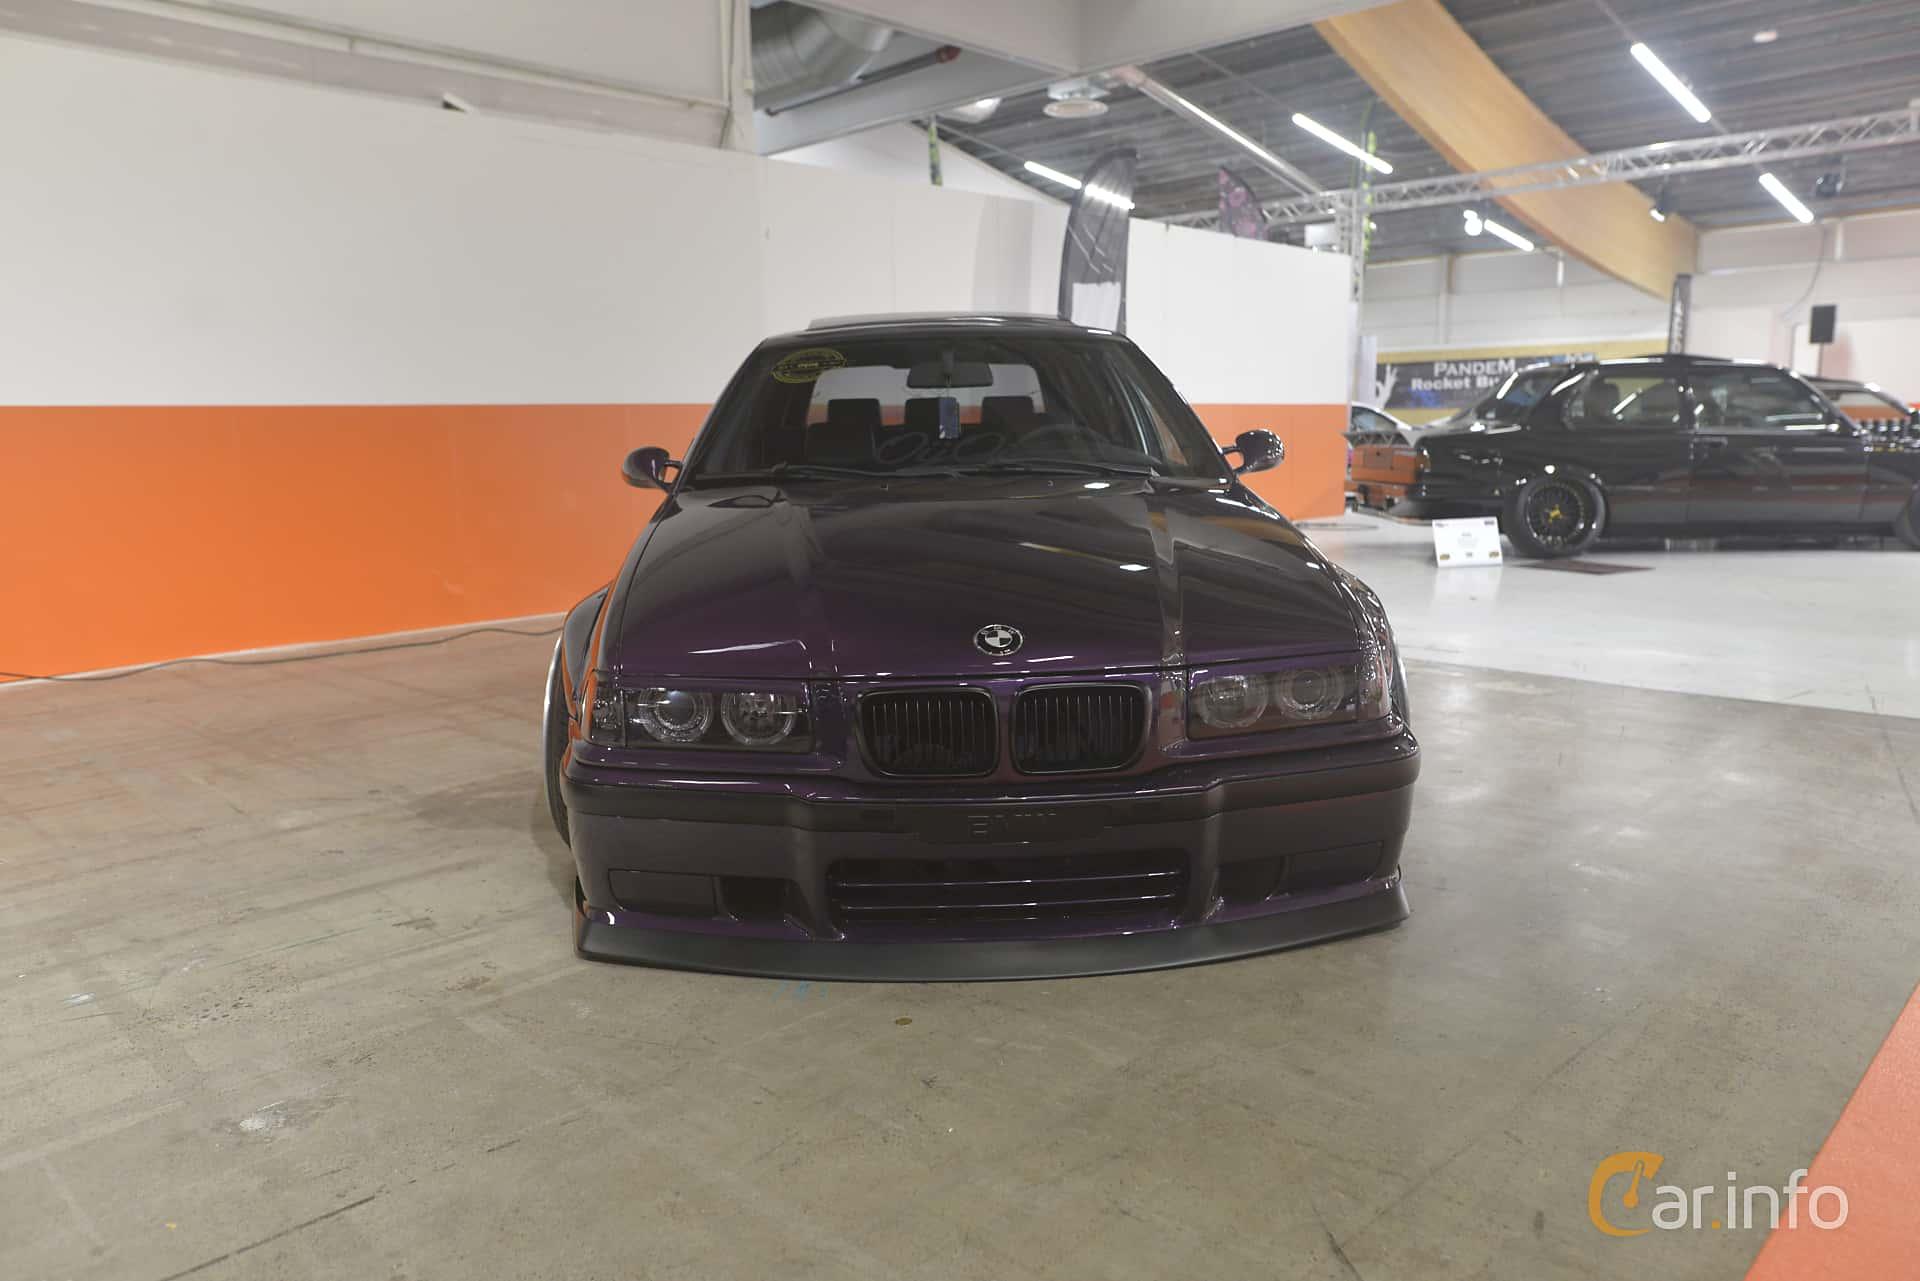 BMW 328i Touring  Automatic, 193hp, 1997 at Bilsport Performance & Custom Motor Show 2019